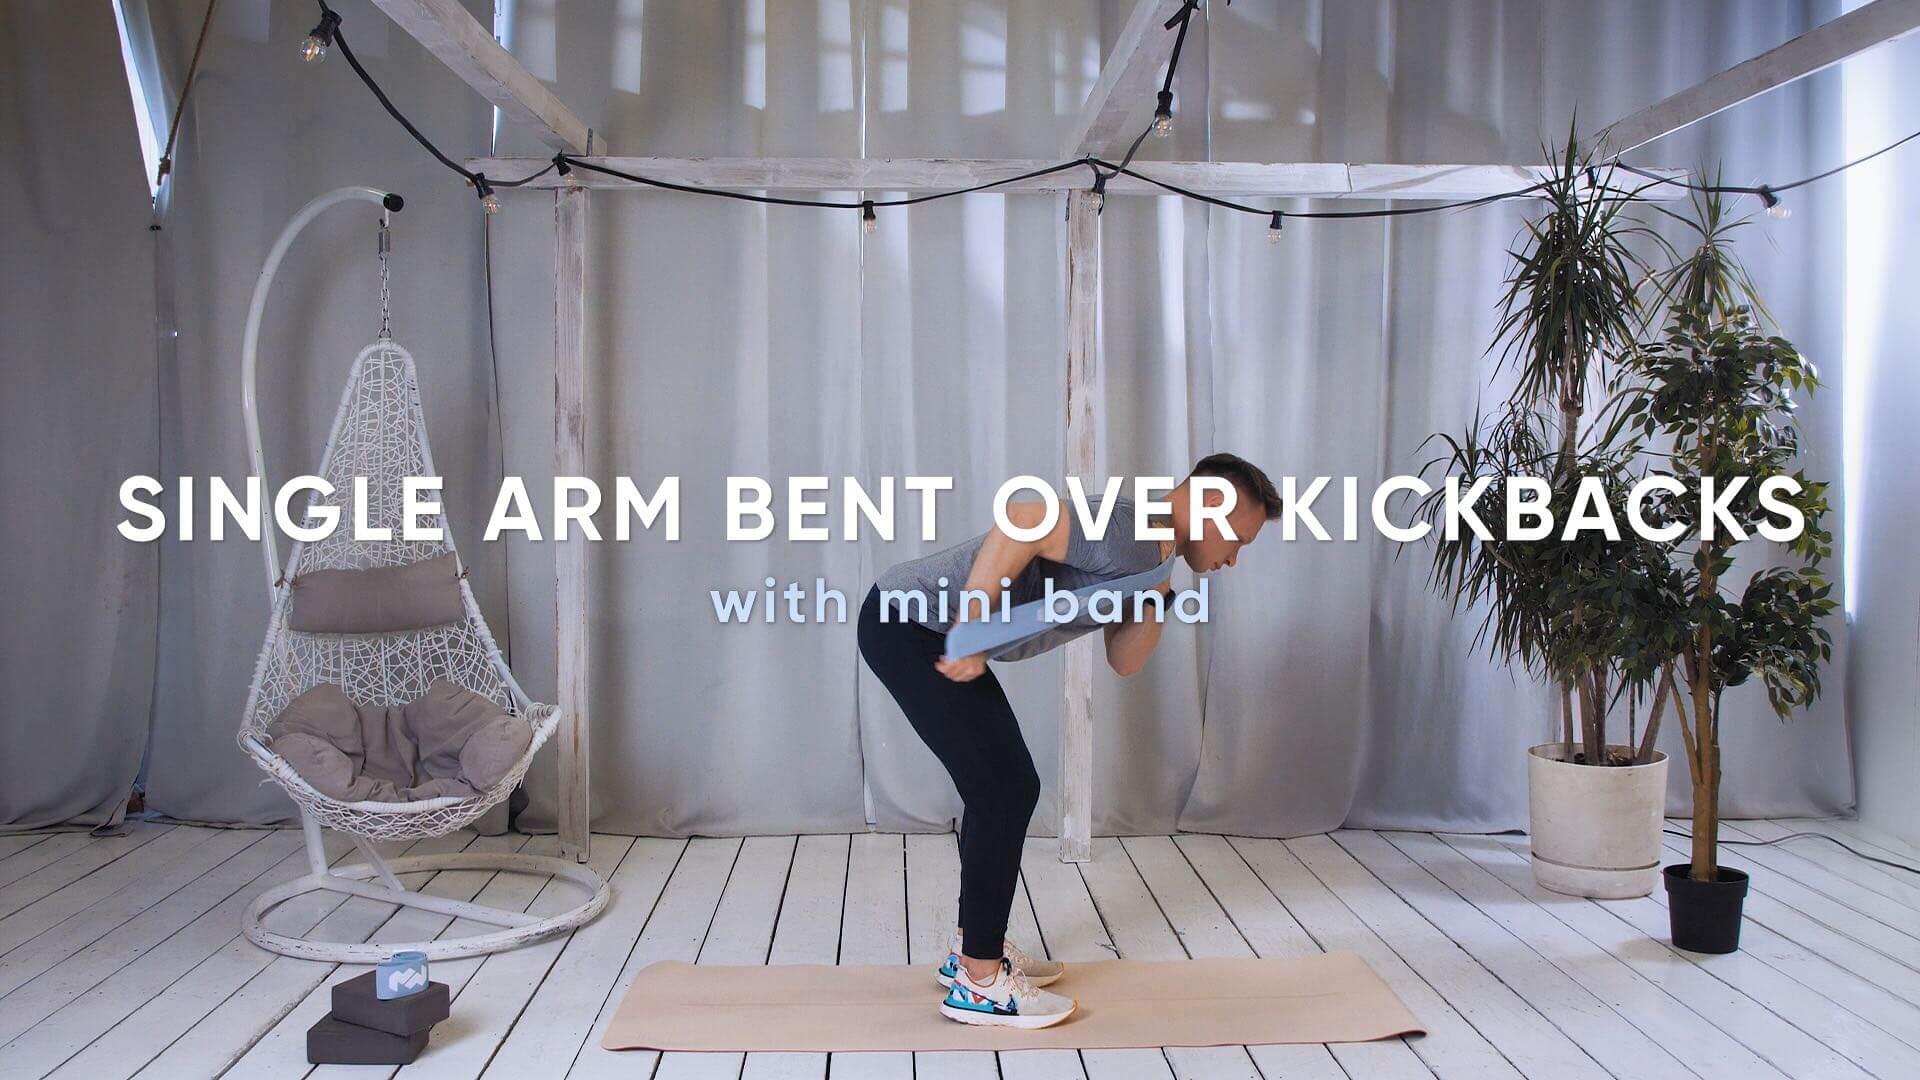 Single arm bent over kickbacks with mini band